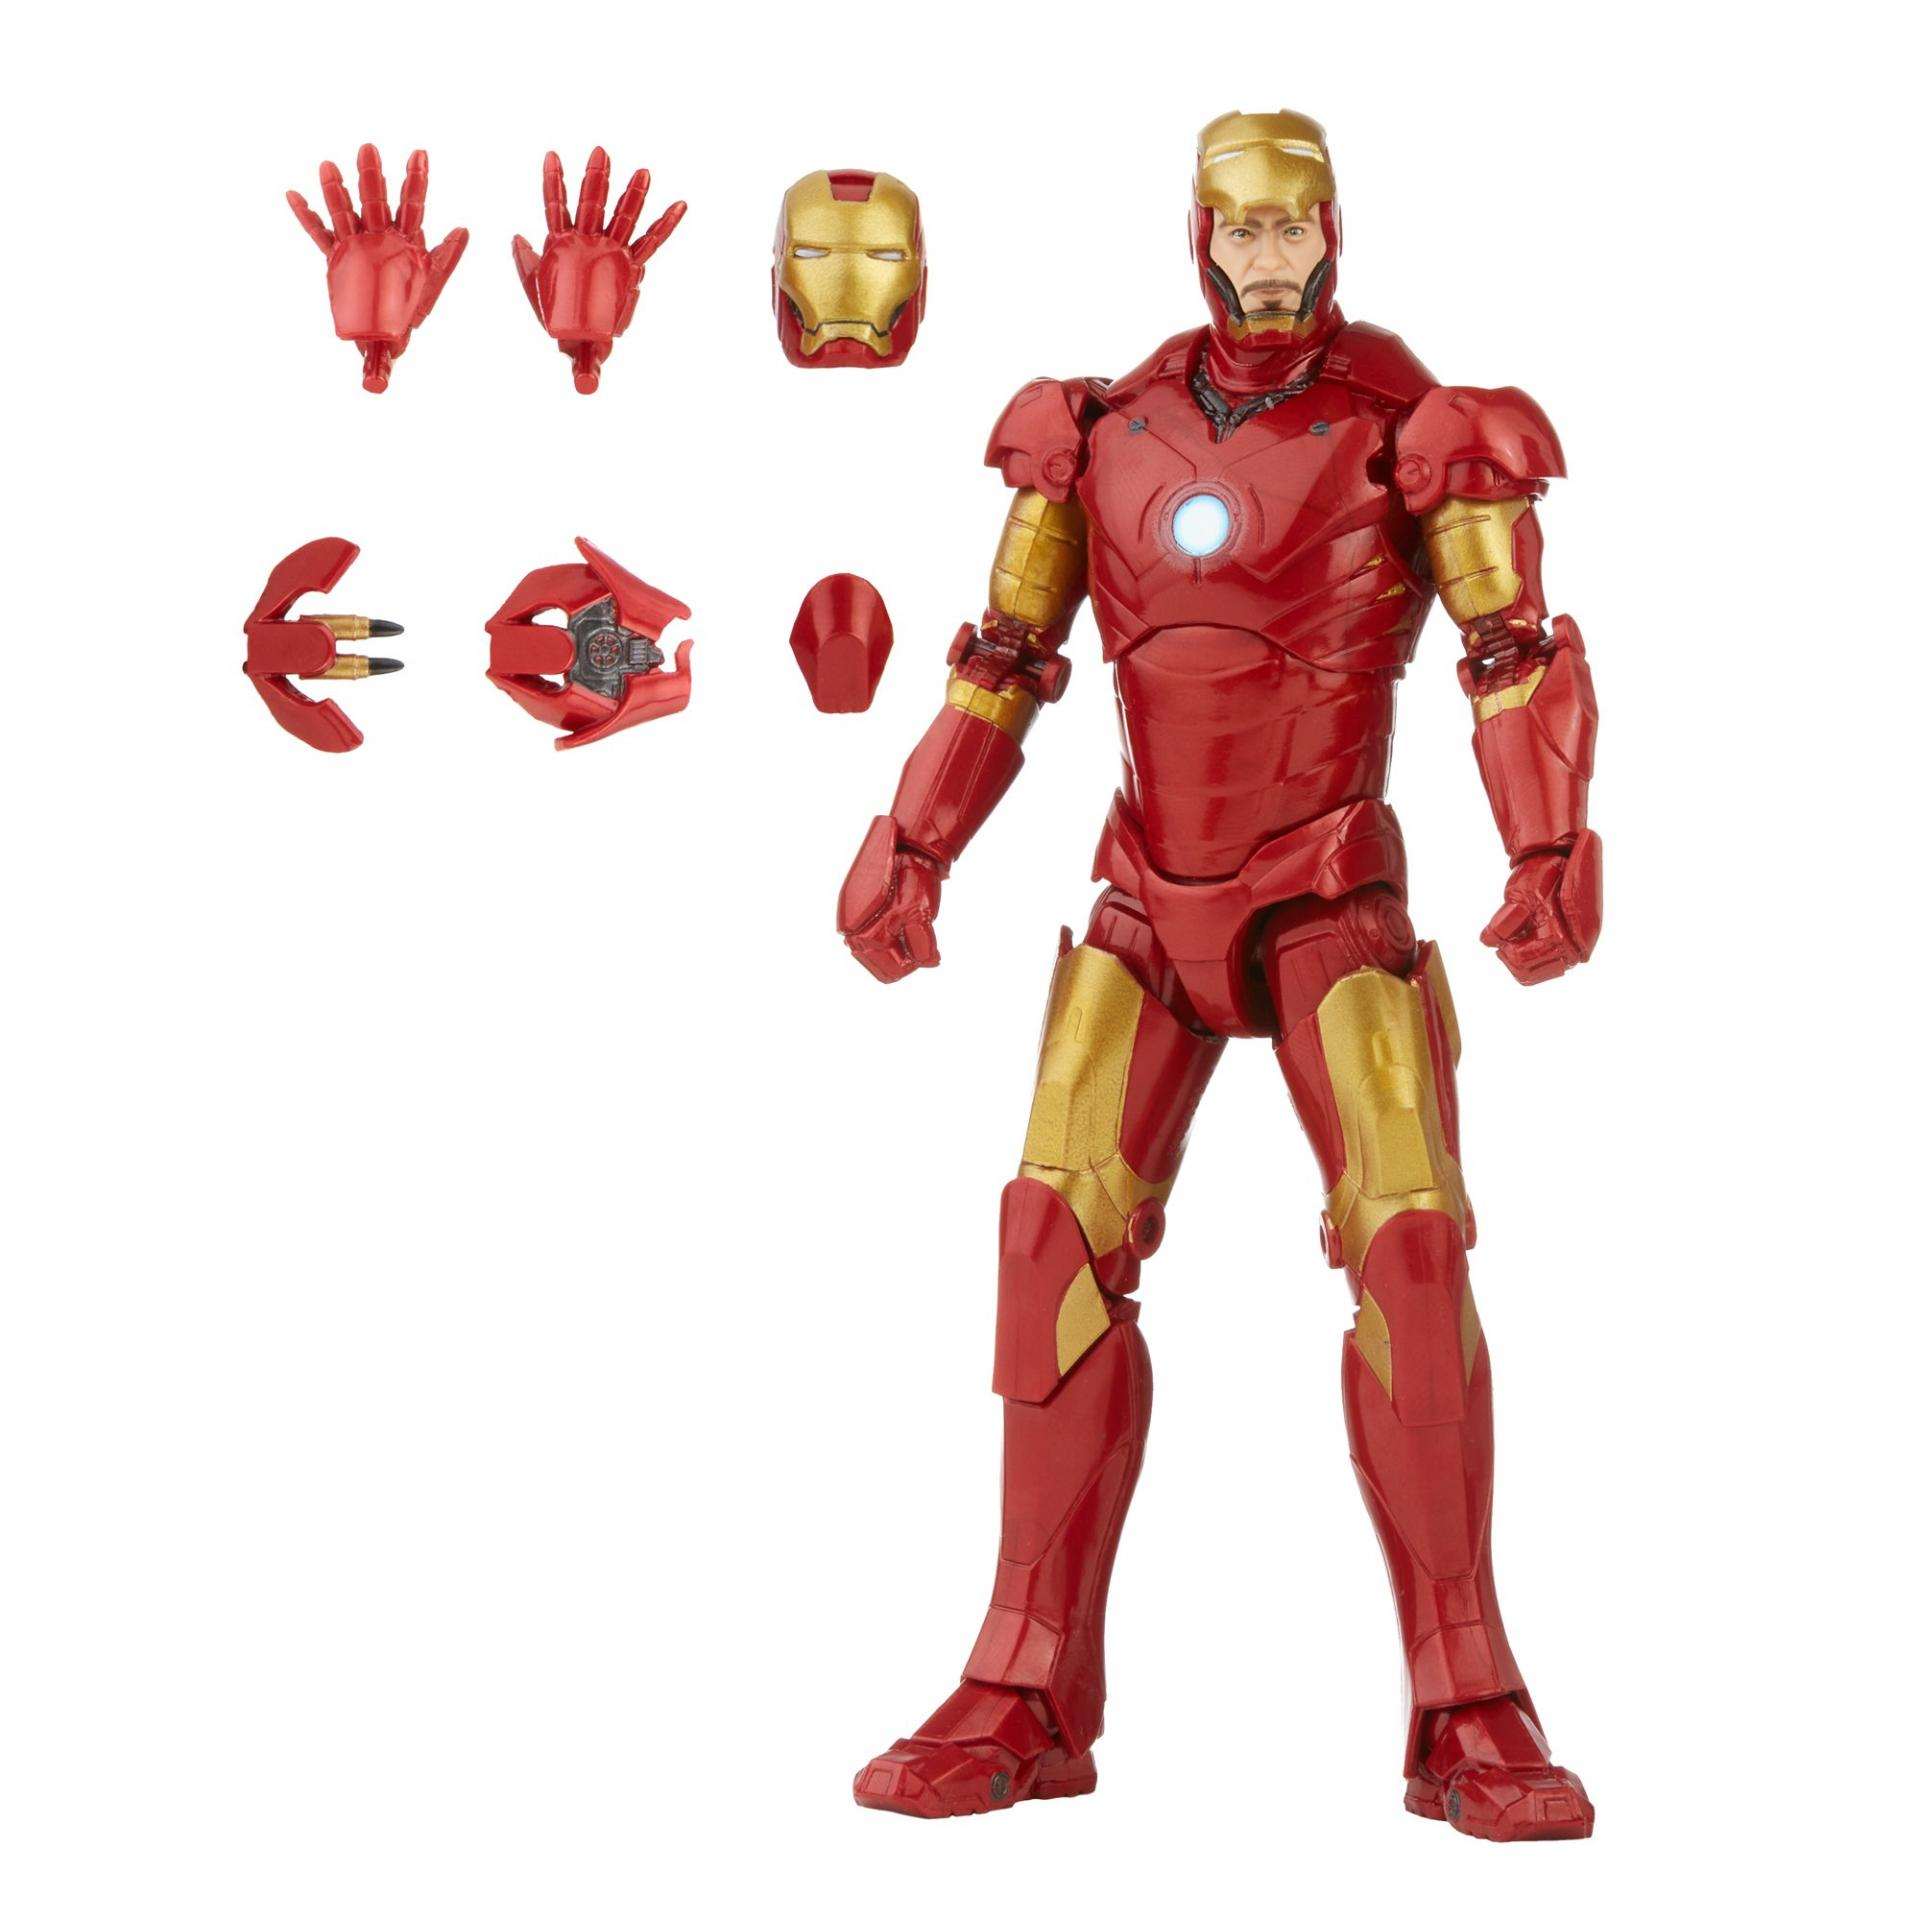 Marvel legends series hasbro iron man mark 313